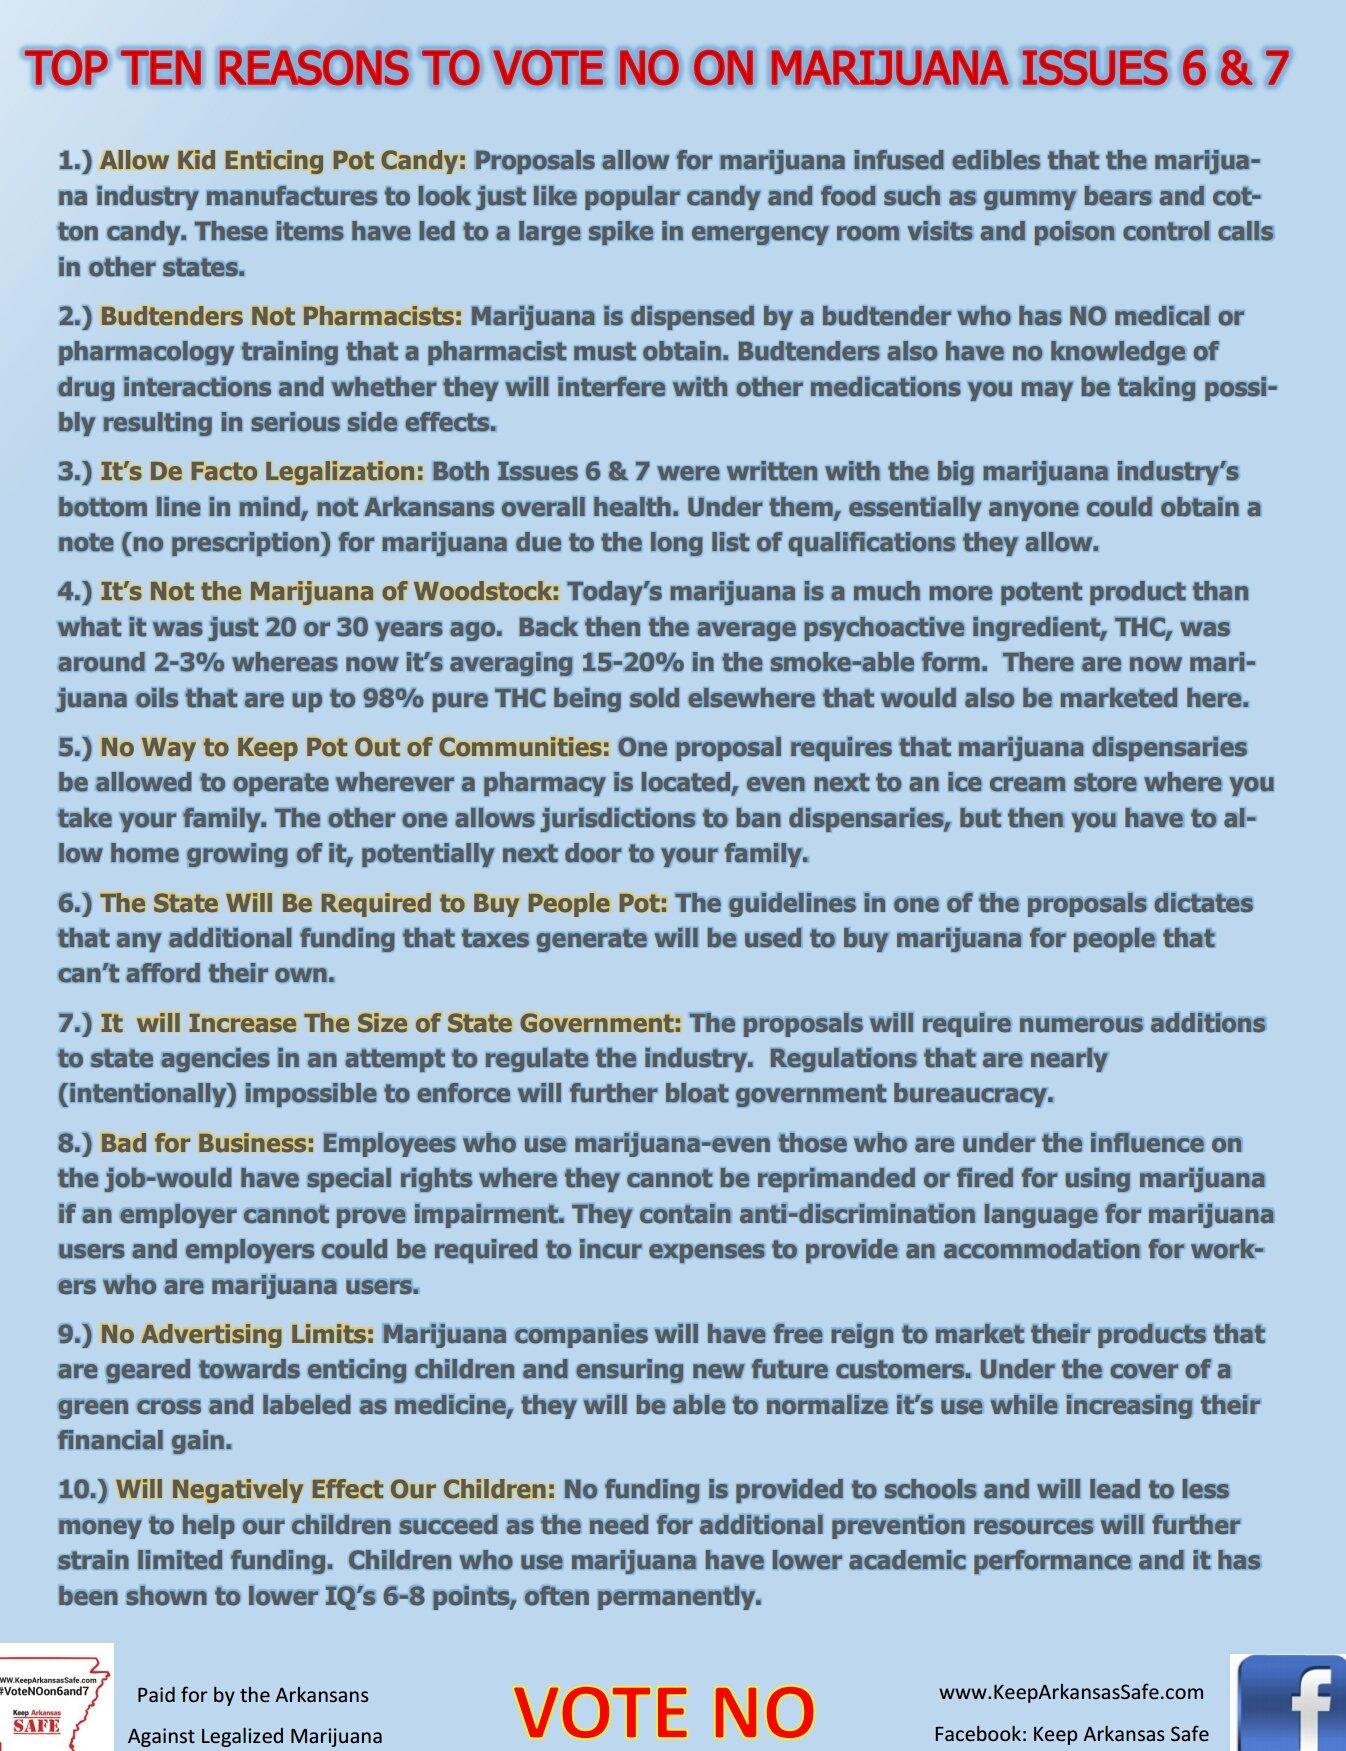 Arkansas Medical Amendment, Issue 6 (2016) - Ballotpedia on blank patient information forms, patient info forms, surgery medical forms, new patient charting, blank medical history forms, patient health forms, new patient intake form, printable nursing assessment forms, physical medical forms, new baby medical forms, new patient form template, insurance medical forms, new patient signs, new patient admissions, medical triage forms, emergency medical forms, diagnosis medical forms, printable doctor fill out forms, hipaa patient consent forms, new patient information form,